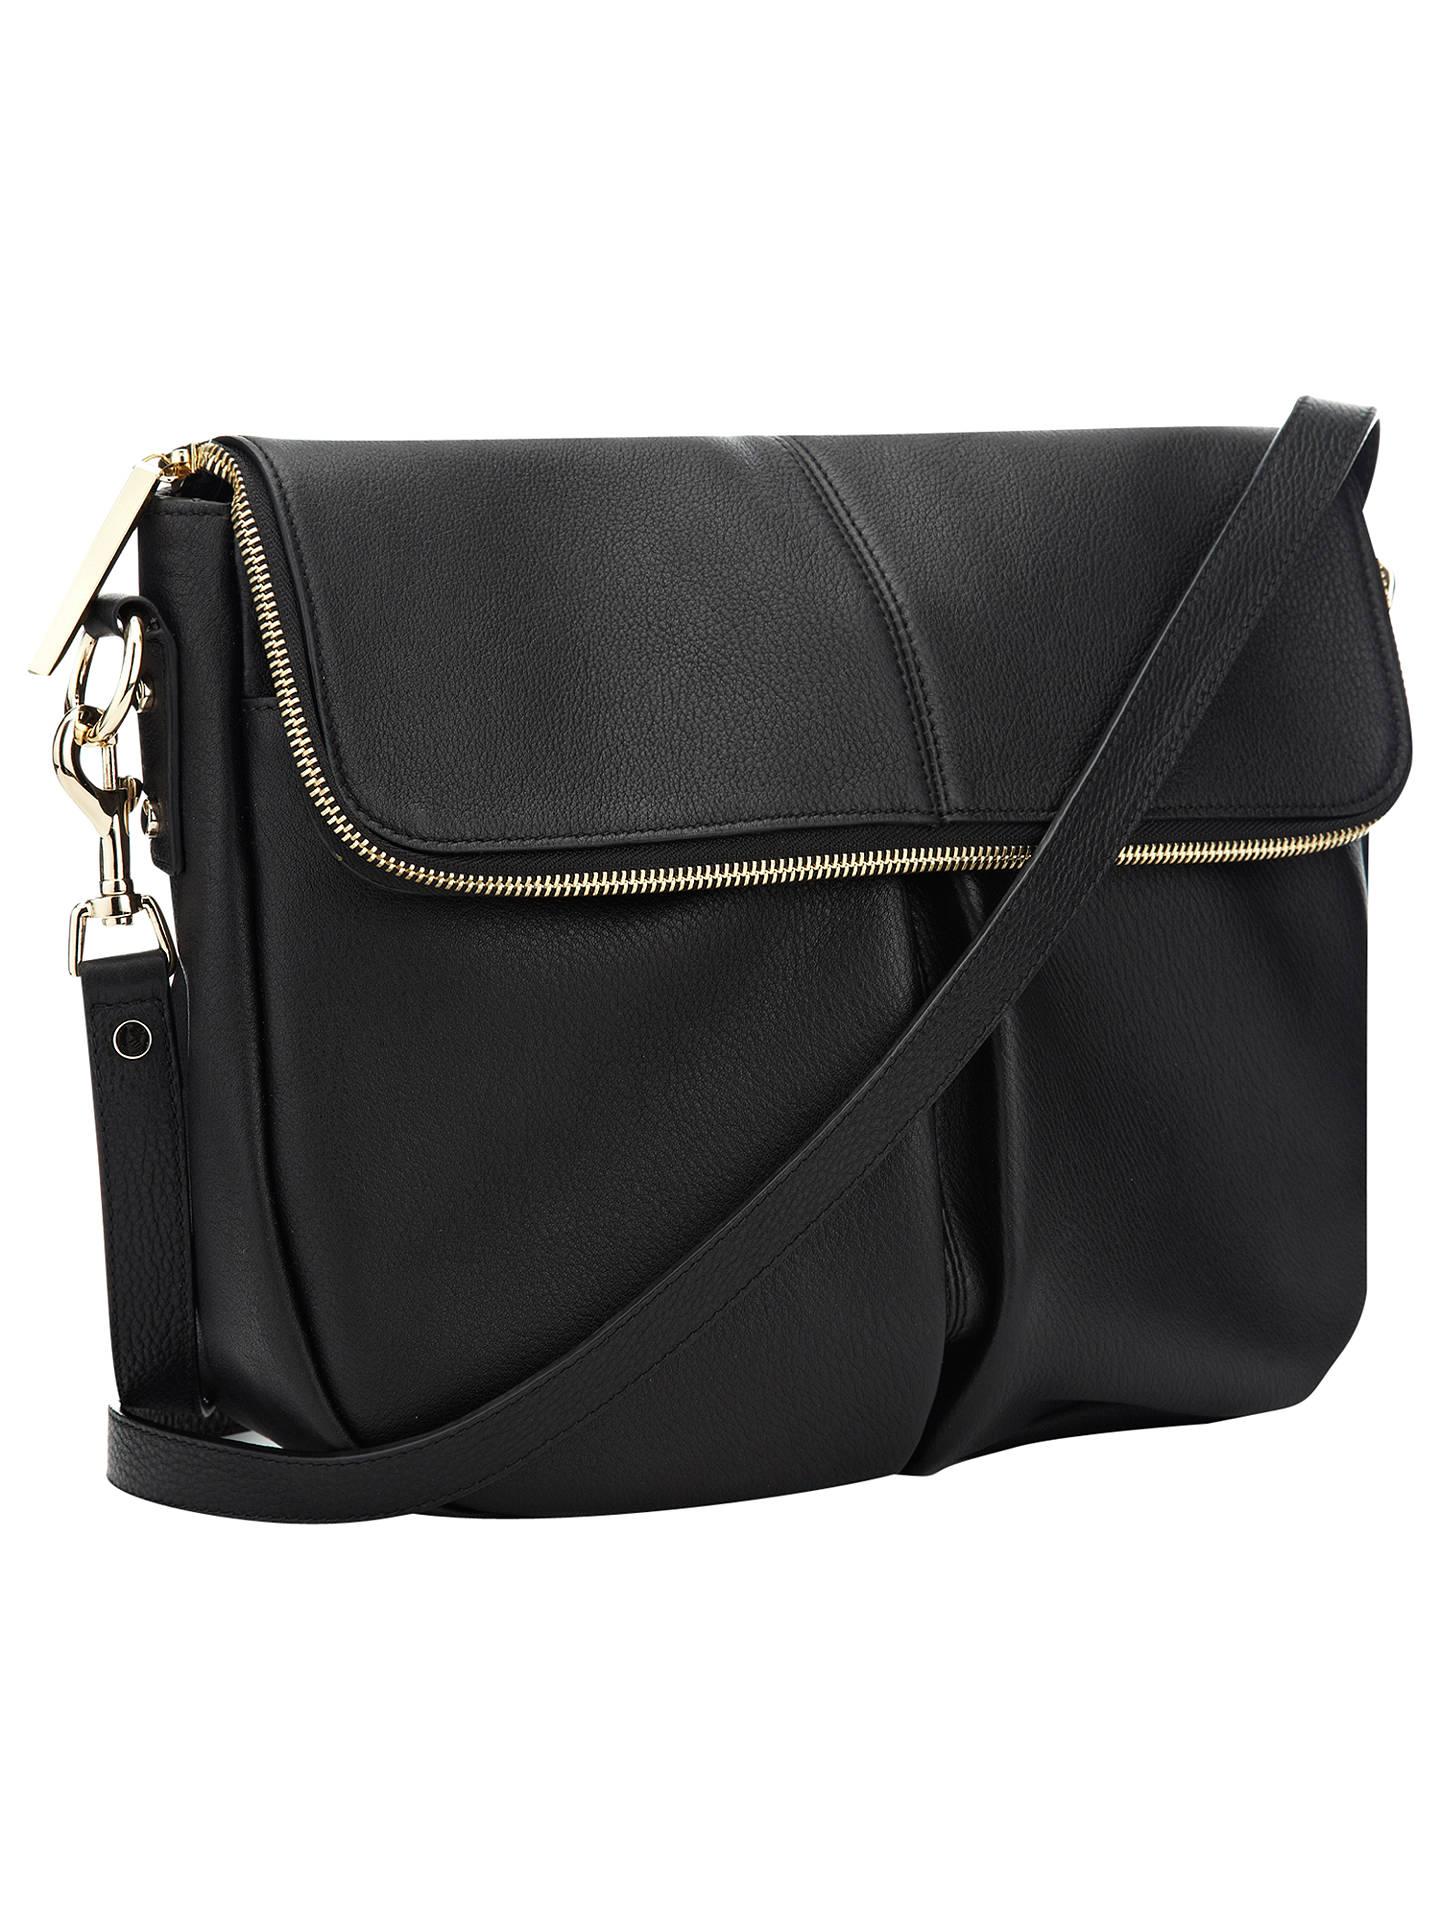 49421195fe Whistles Duffy Zip Leather Satchel Bag at John Lewis   Partners